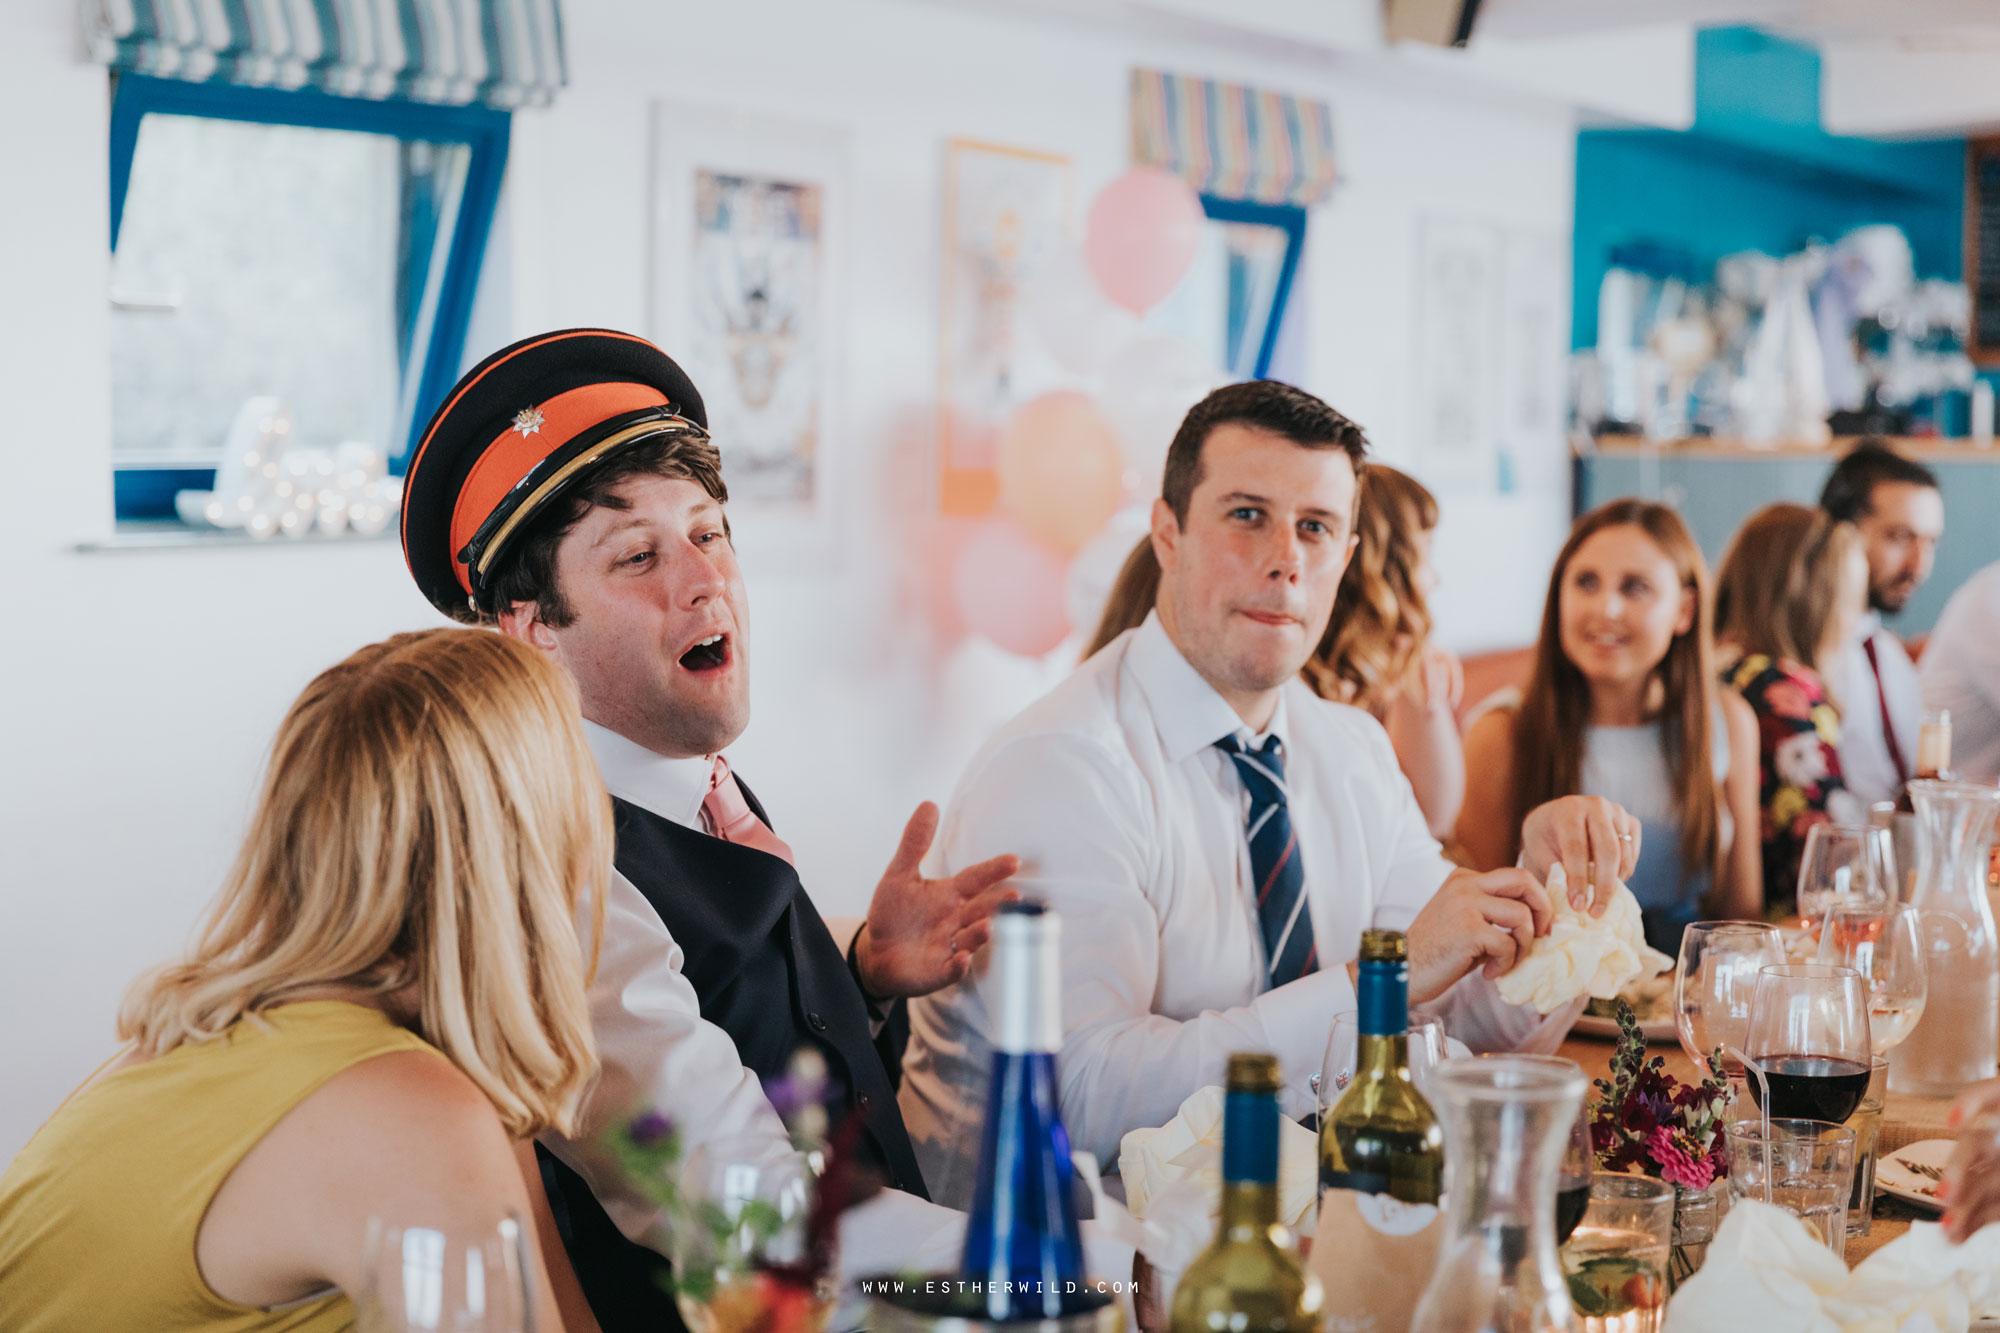 Cromer_Wedding_Beach_Outdoor_Ceremony_Norfolk_North_Lodge_Registry_Office_Rocket_House_Cafe_Cromer_Pier_IMG_4953.jpg